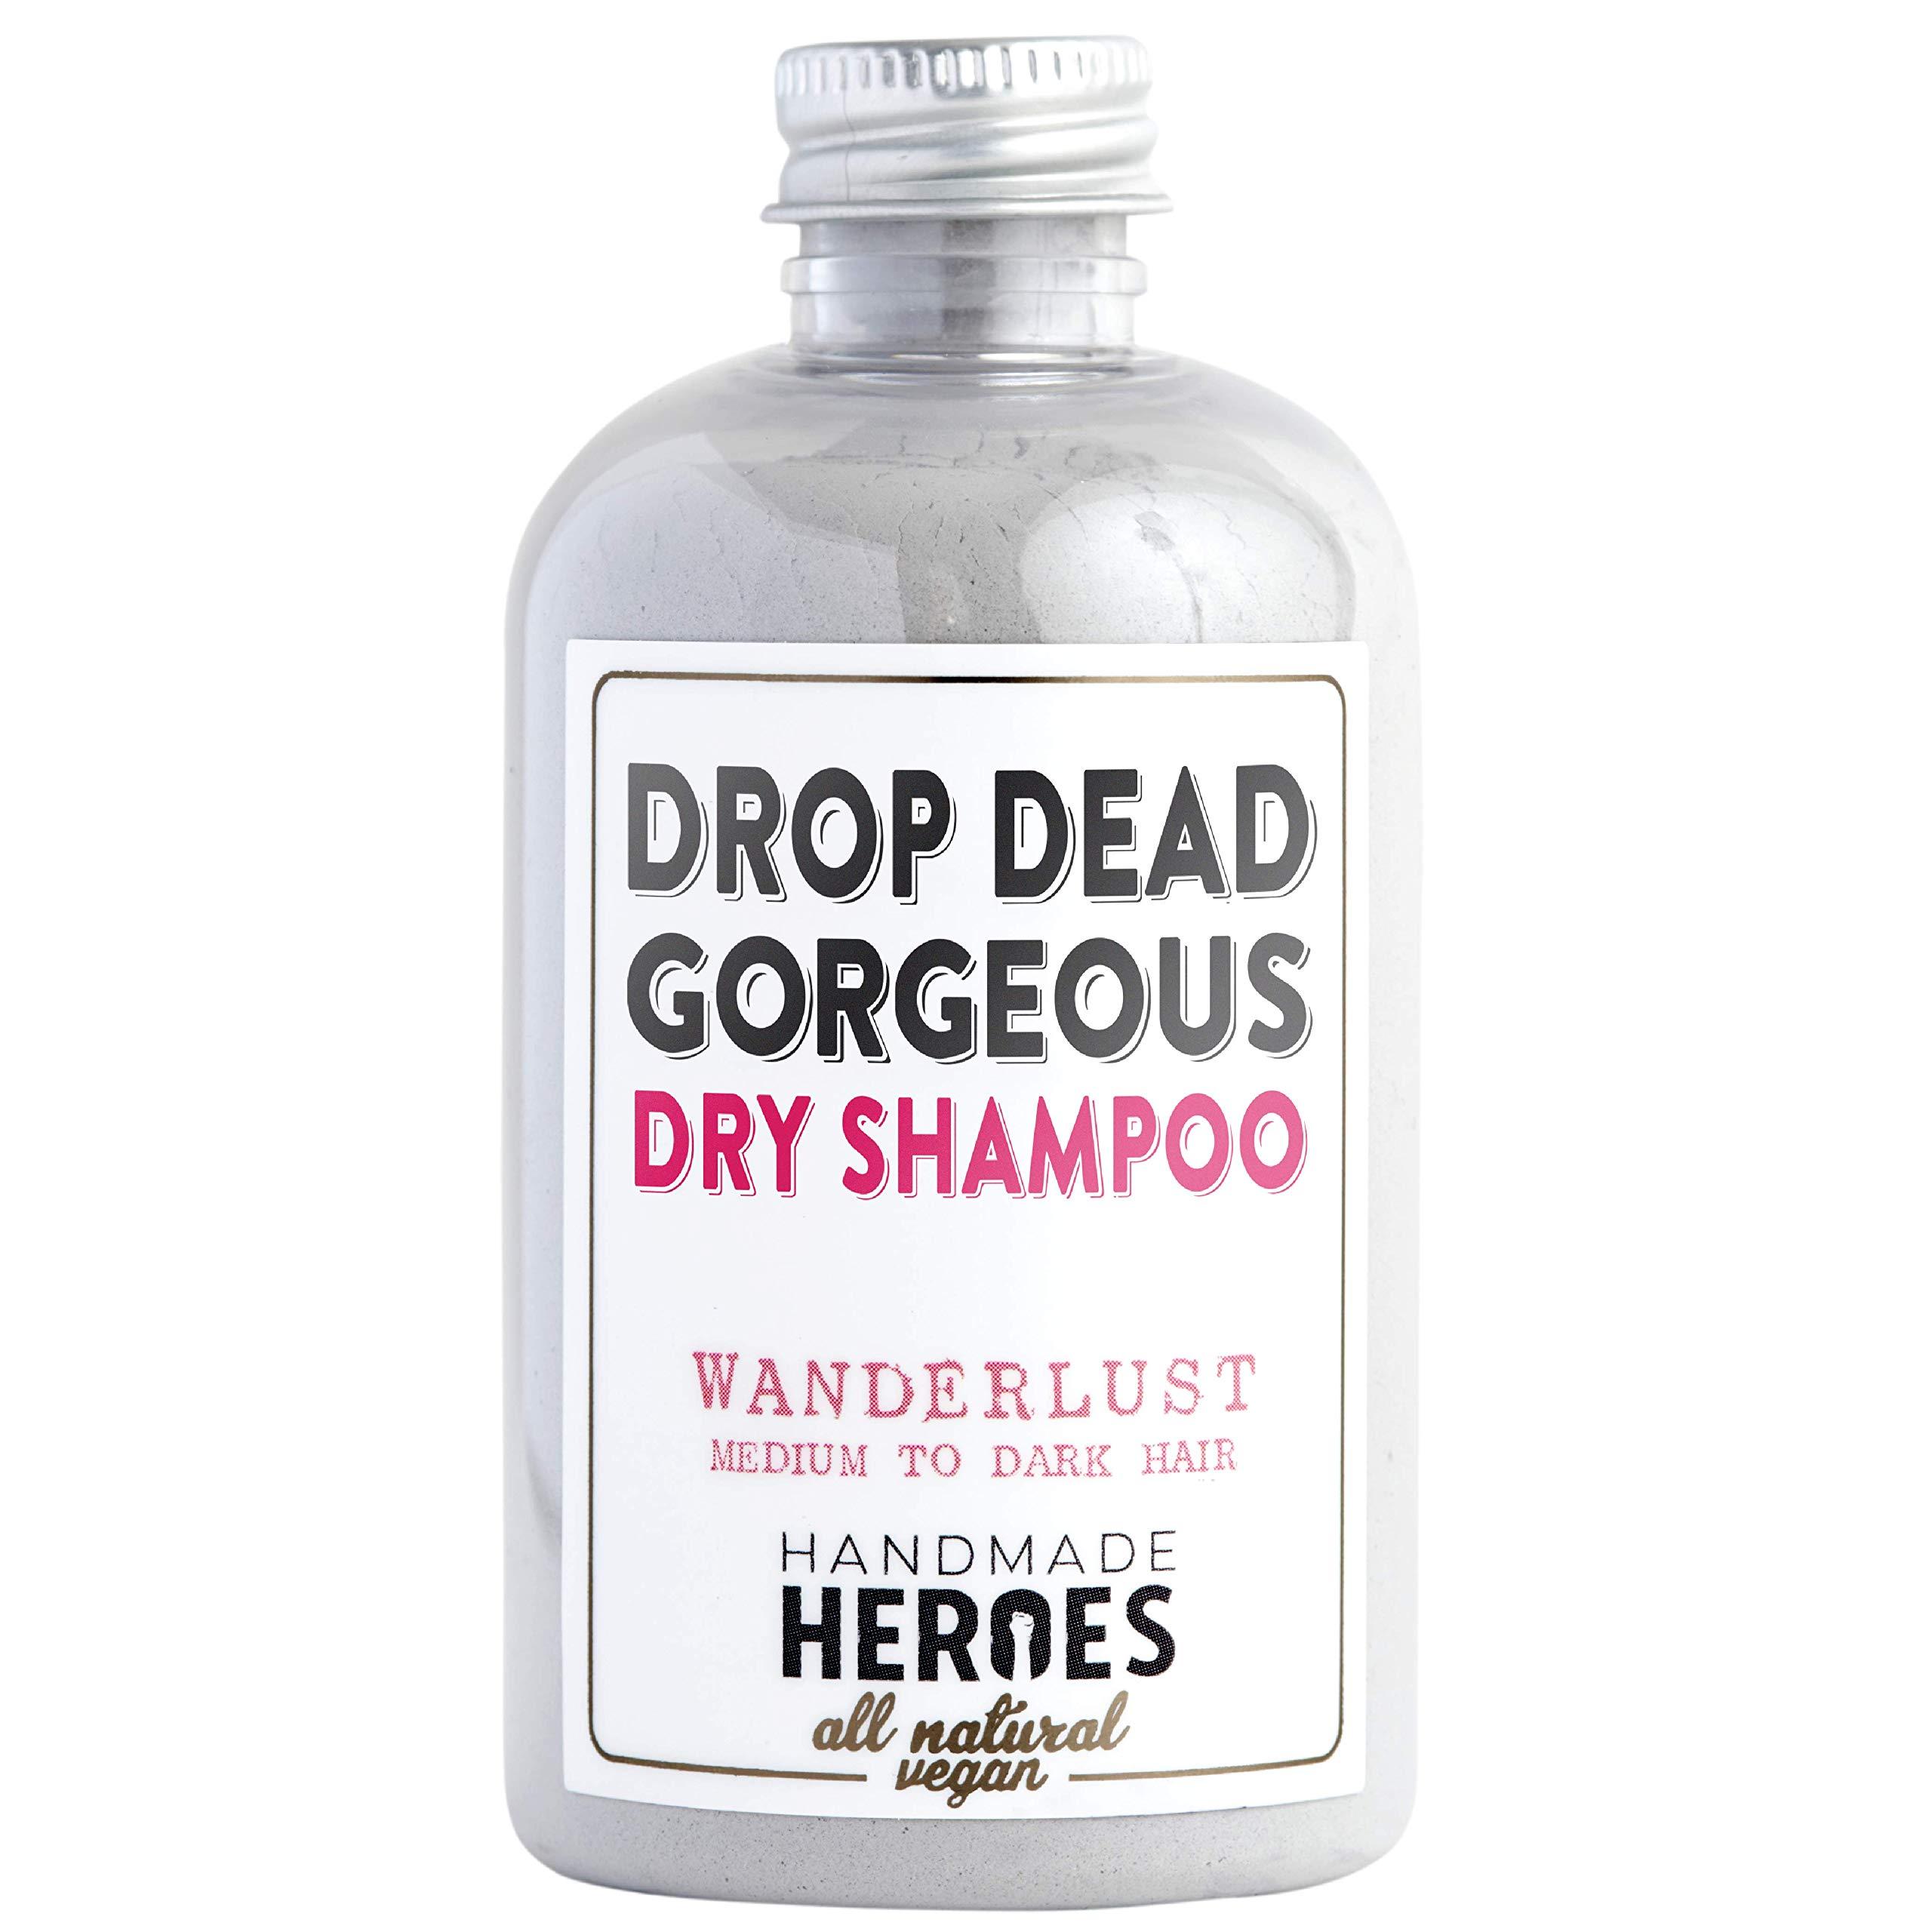 All Natural, Vegan Dry Shampoo Powder - For Medium to Dark Color & Brunette Hair - Volume Hair Powder | Travel size | 2 ounces by Handmade Heroes